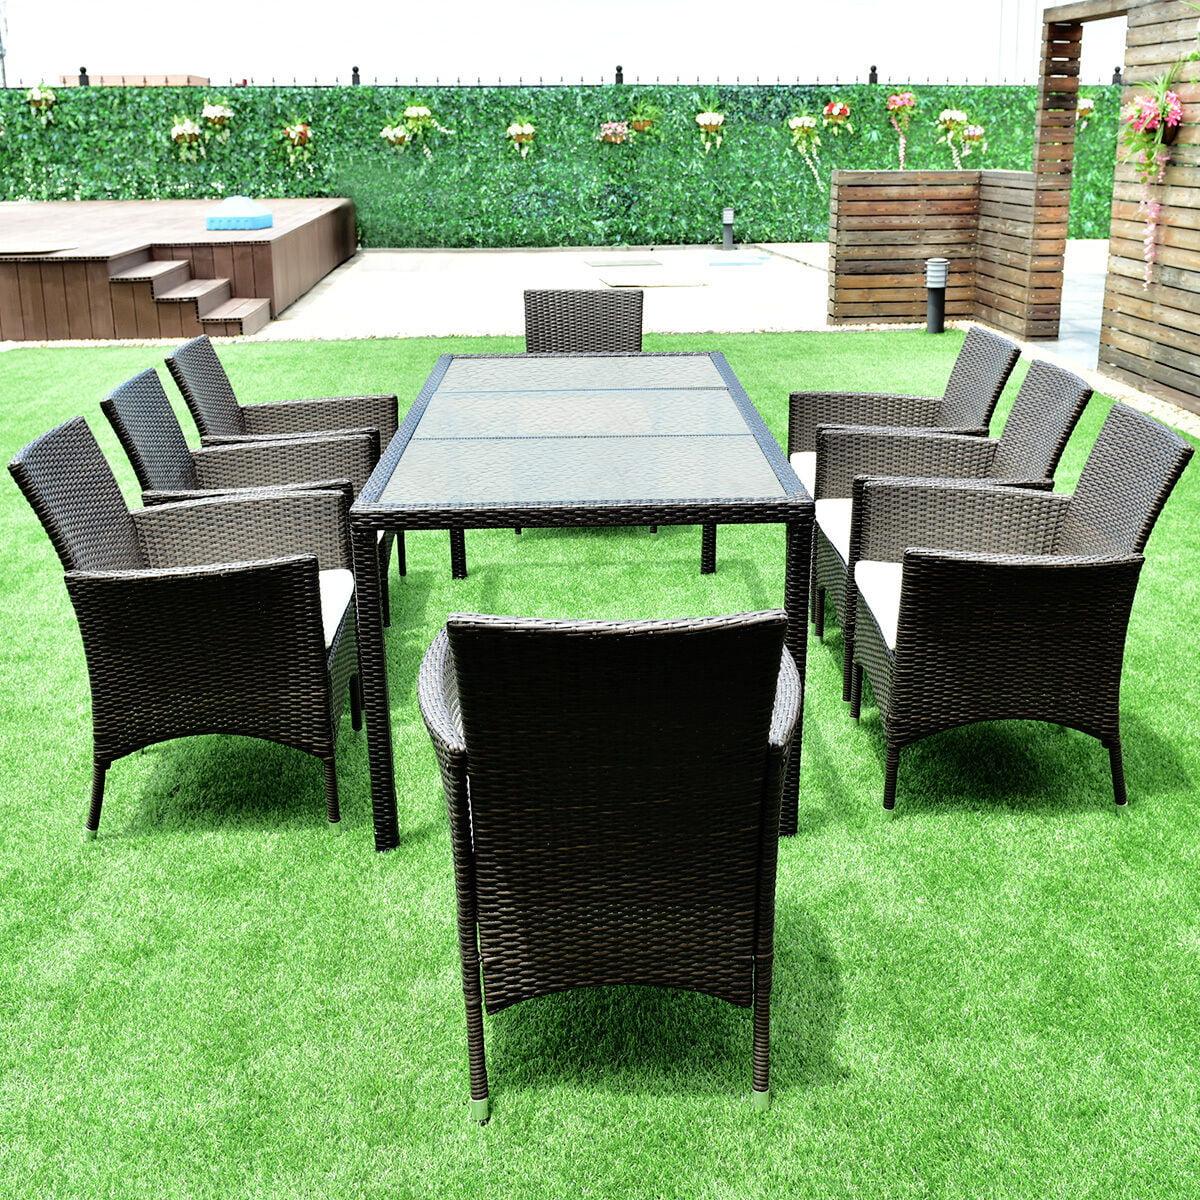 gymax 9pcs patio furniture set